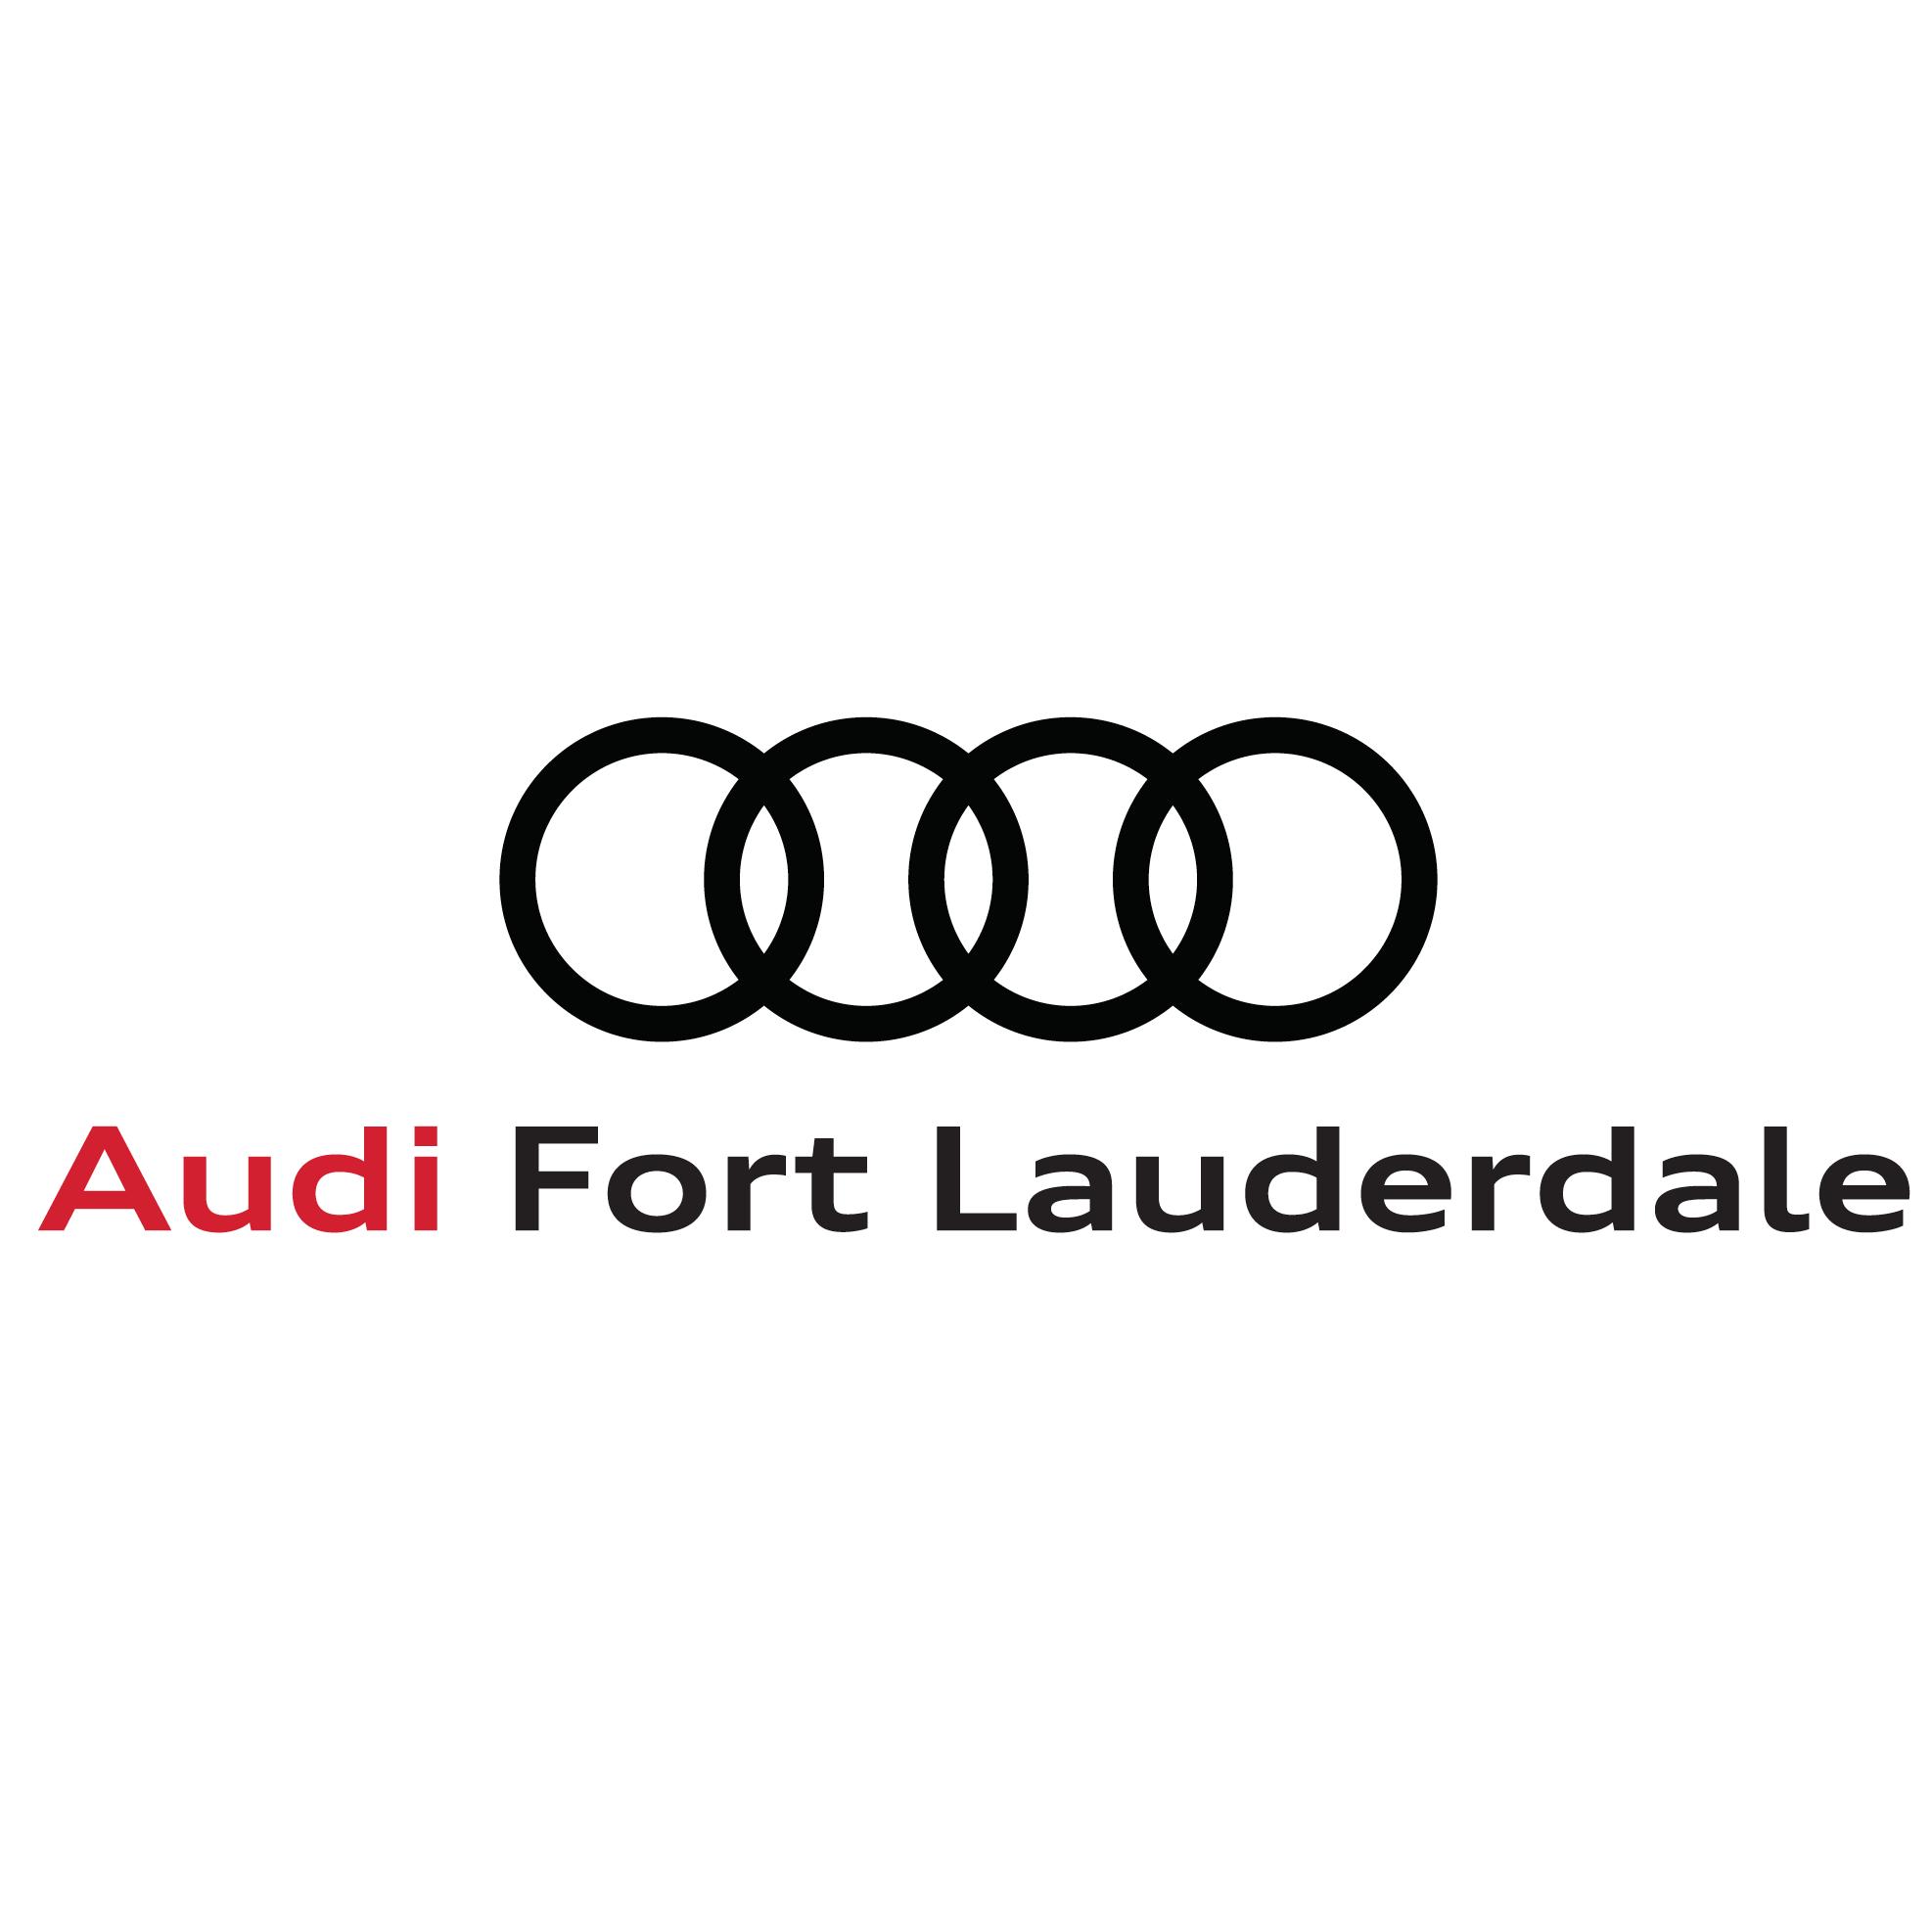 Audi Fort Lauderdale